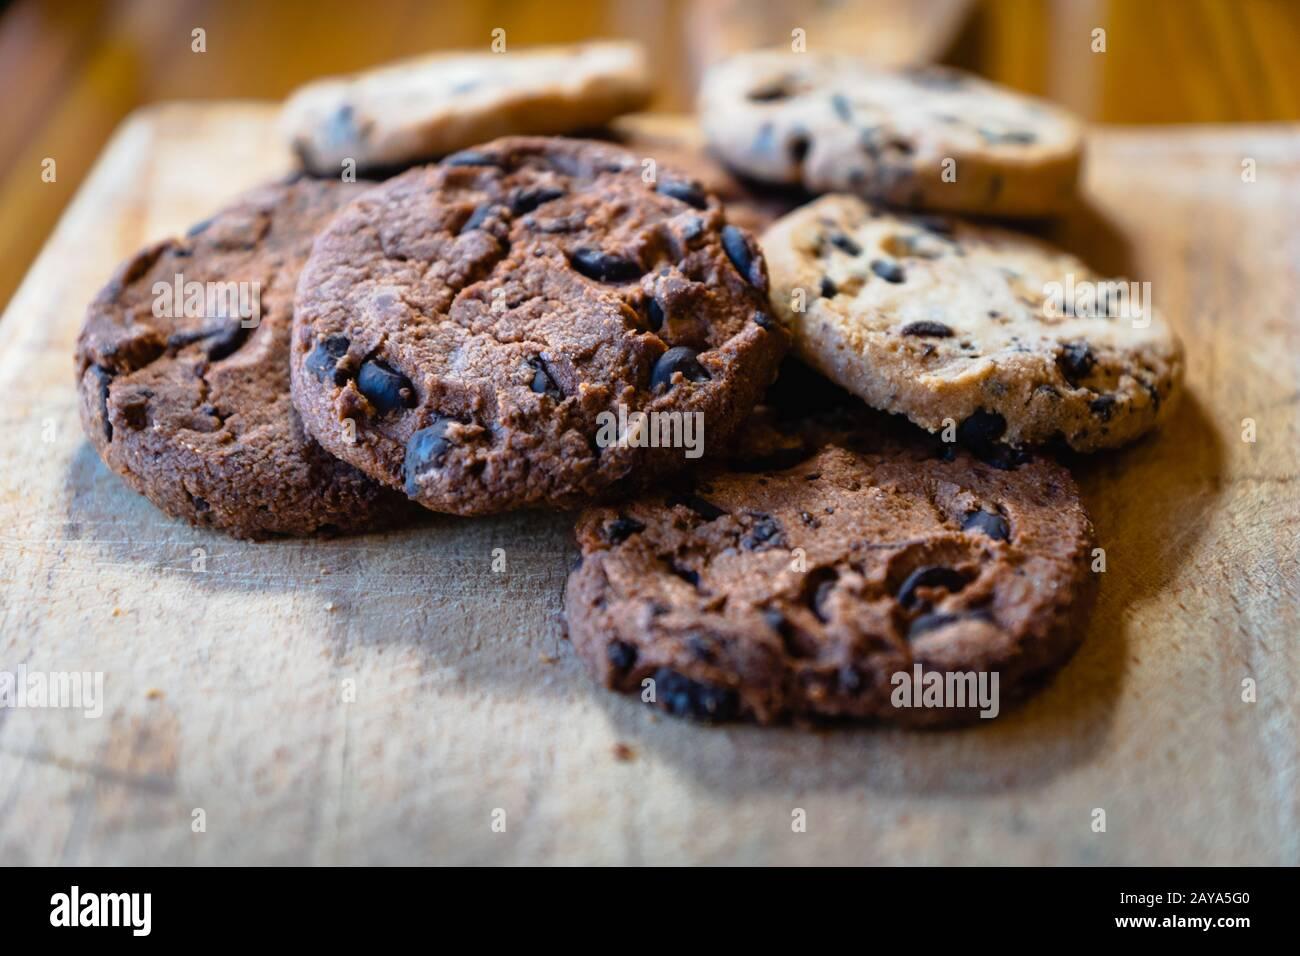 pila de galletas con trocitos de chocolate: galletas horneadas, postre, productos dulces Foto de stock